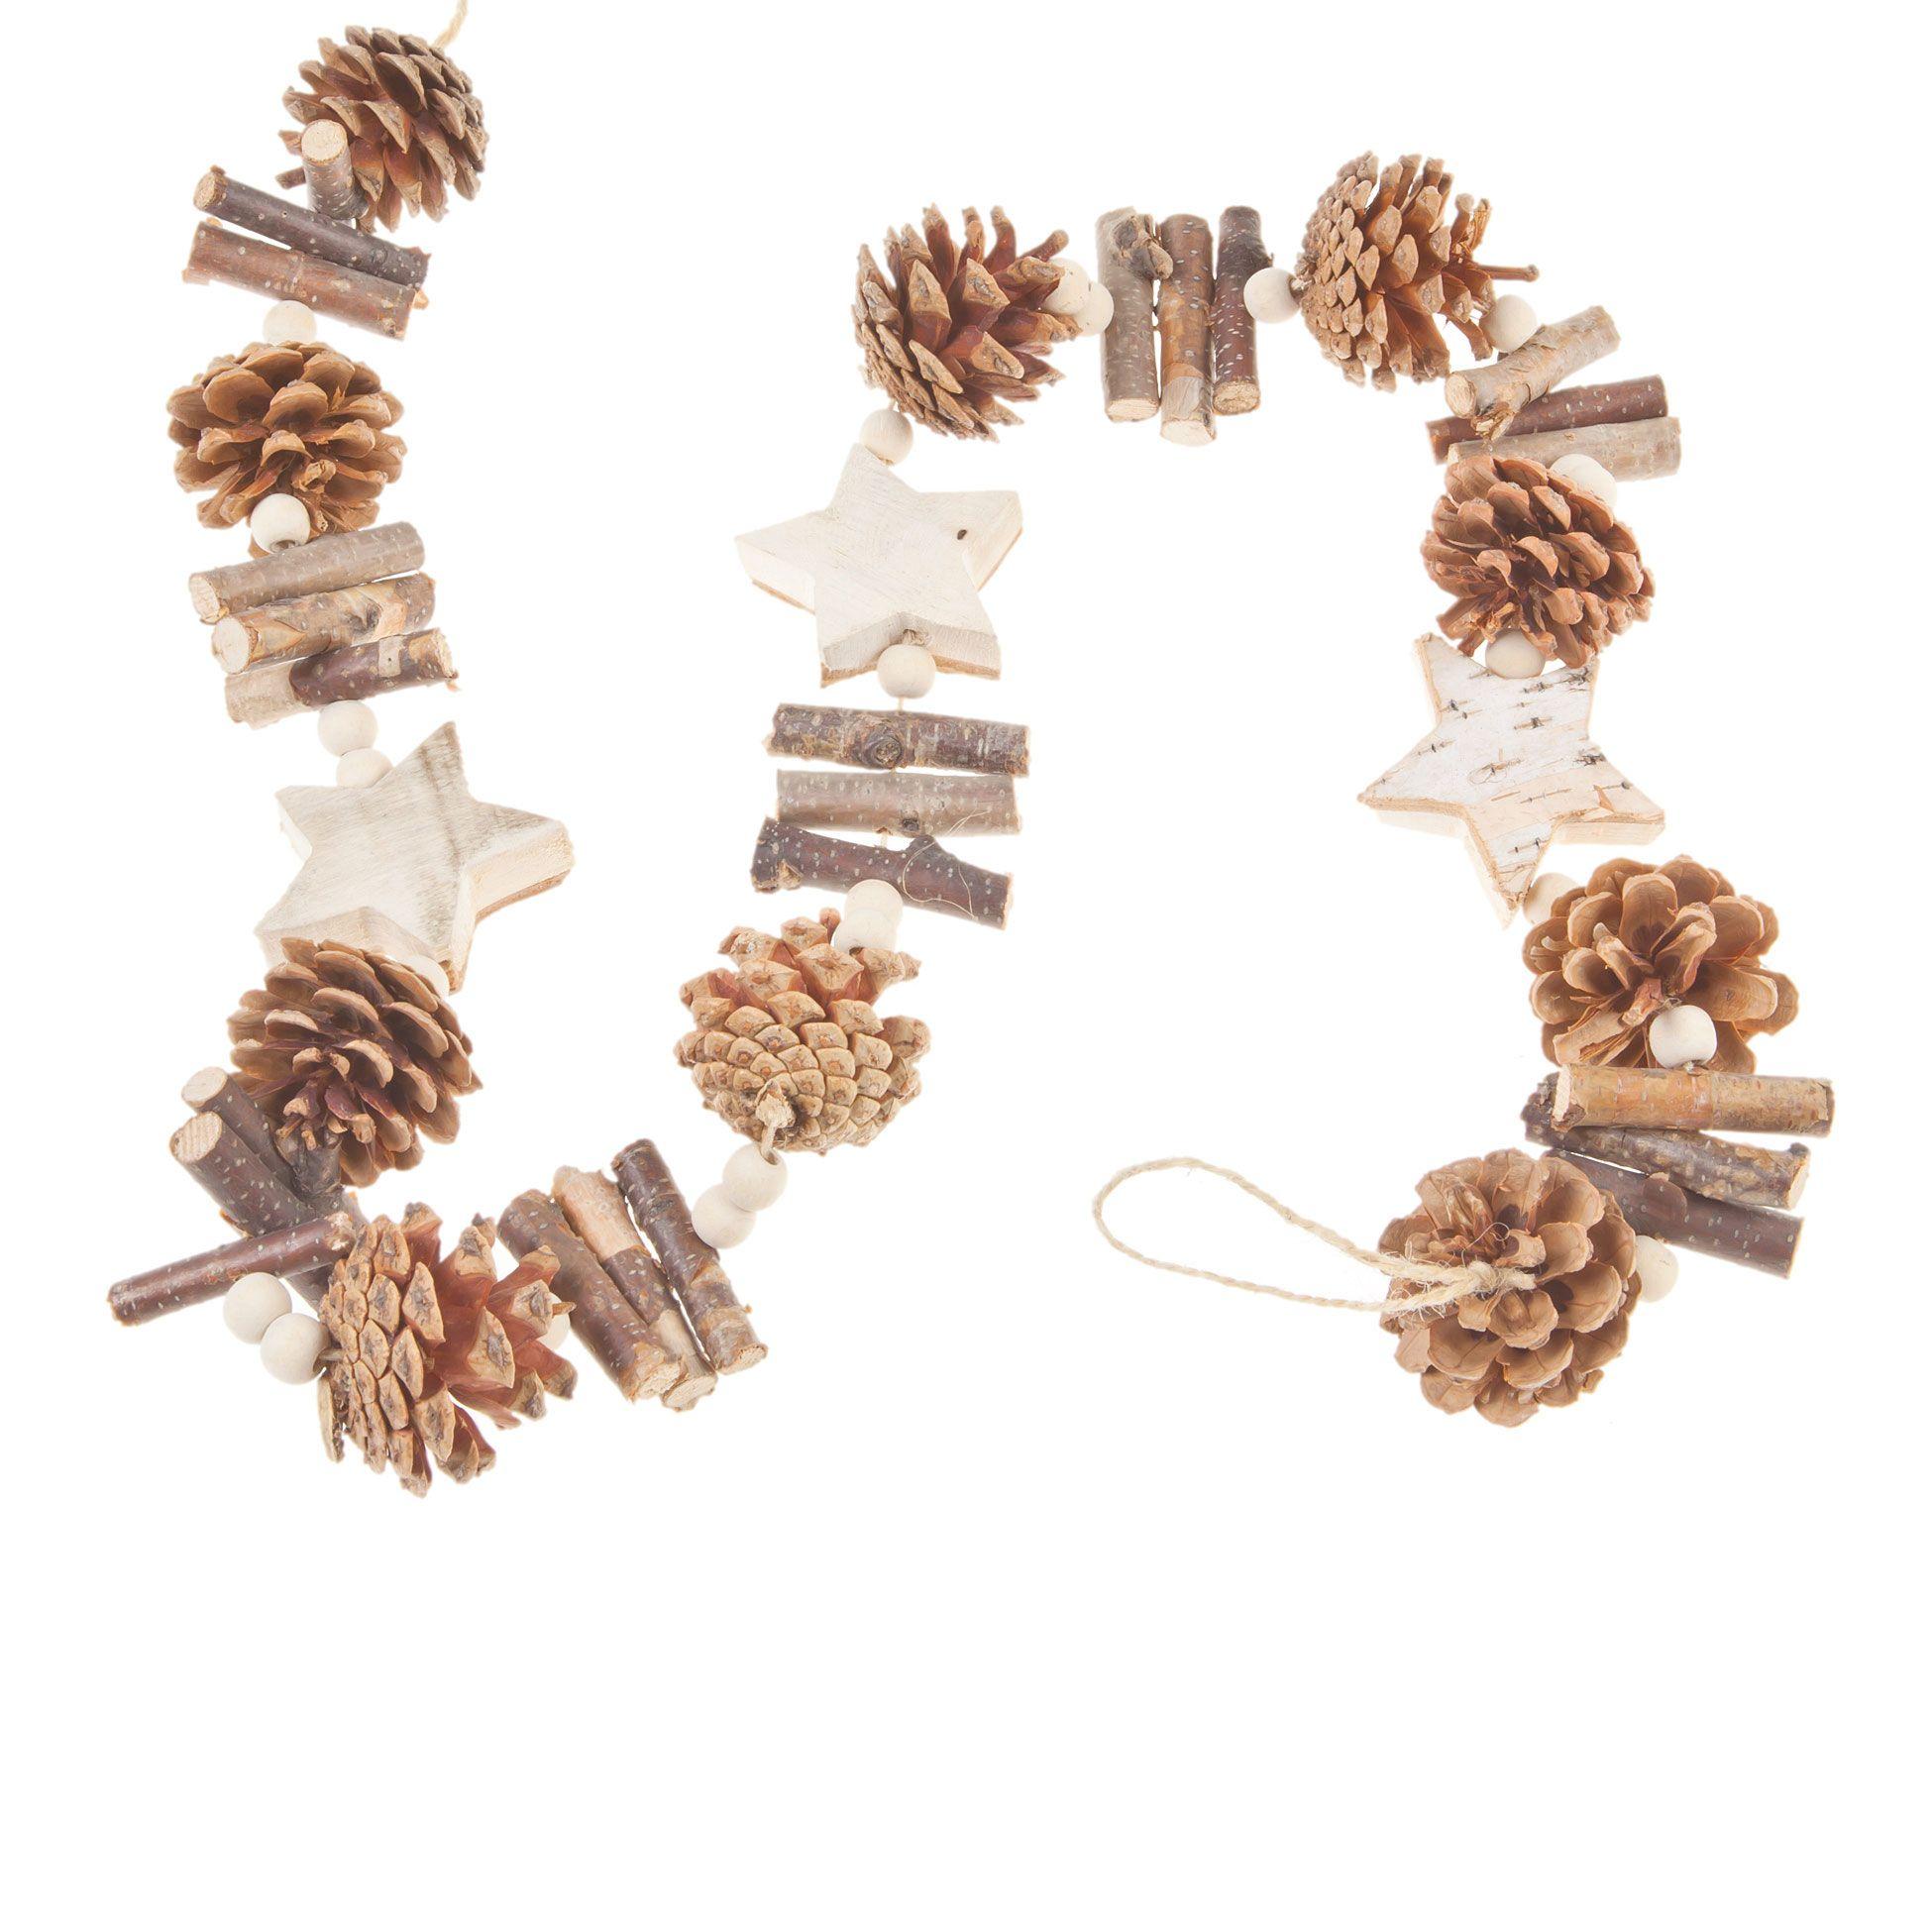 garland star wood and pine cones decoration collection christmas guirlande toiles en. Black Bedroom Furniture Sets. Home Design Ideas